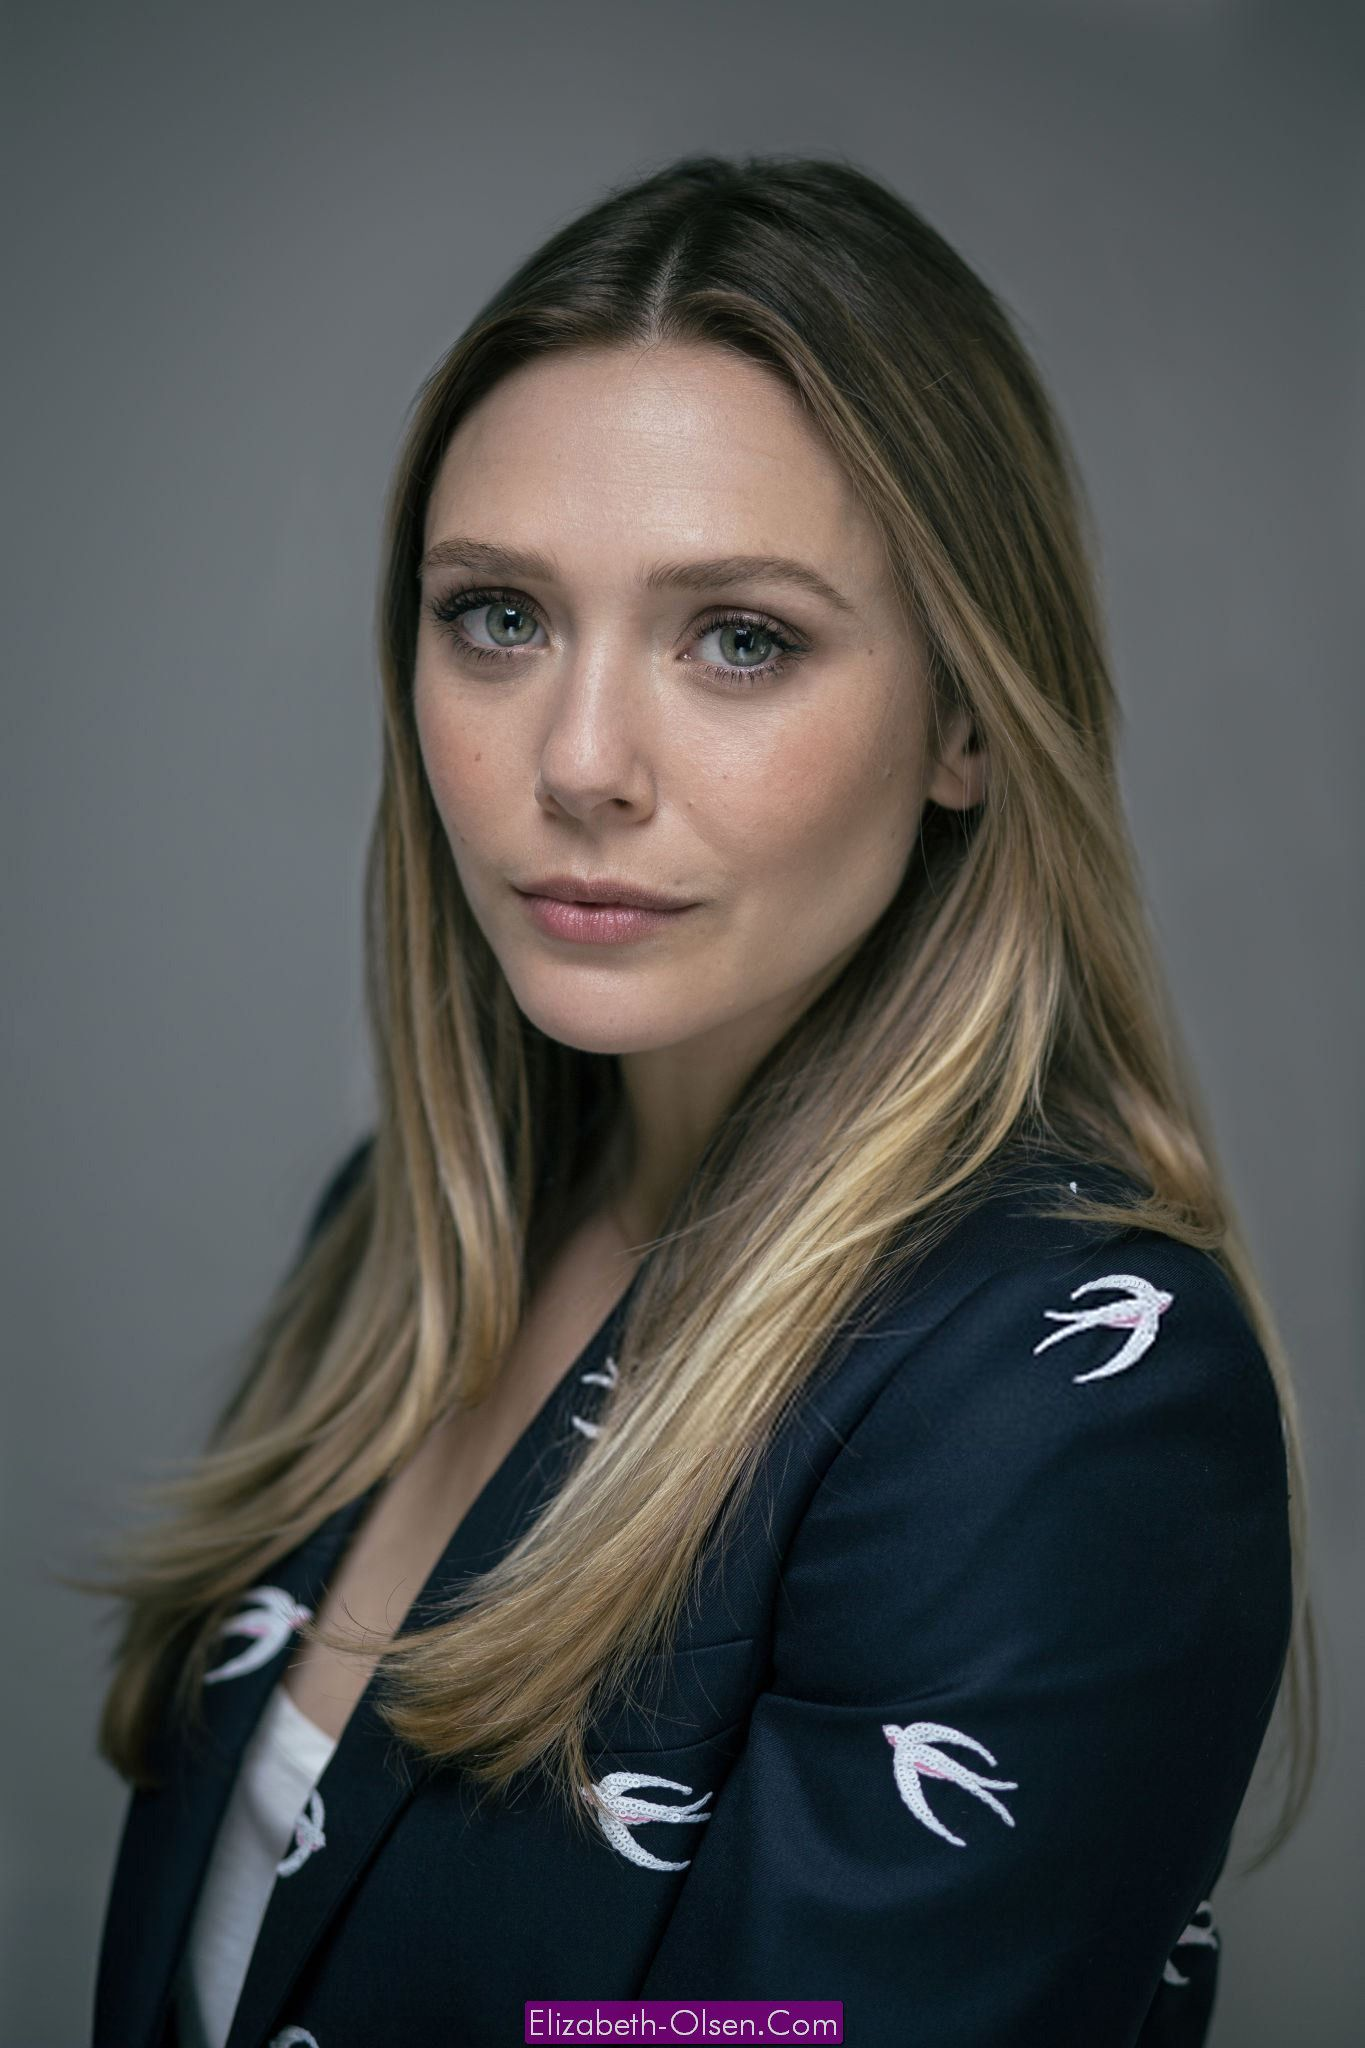 pics Elizabeth Olsen Is Soft Effortless At Cannes, Get TheLook